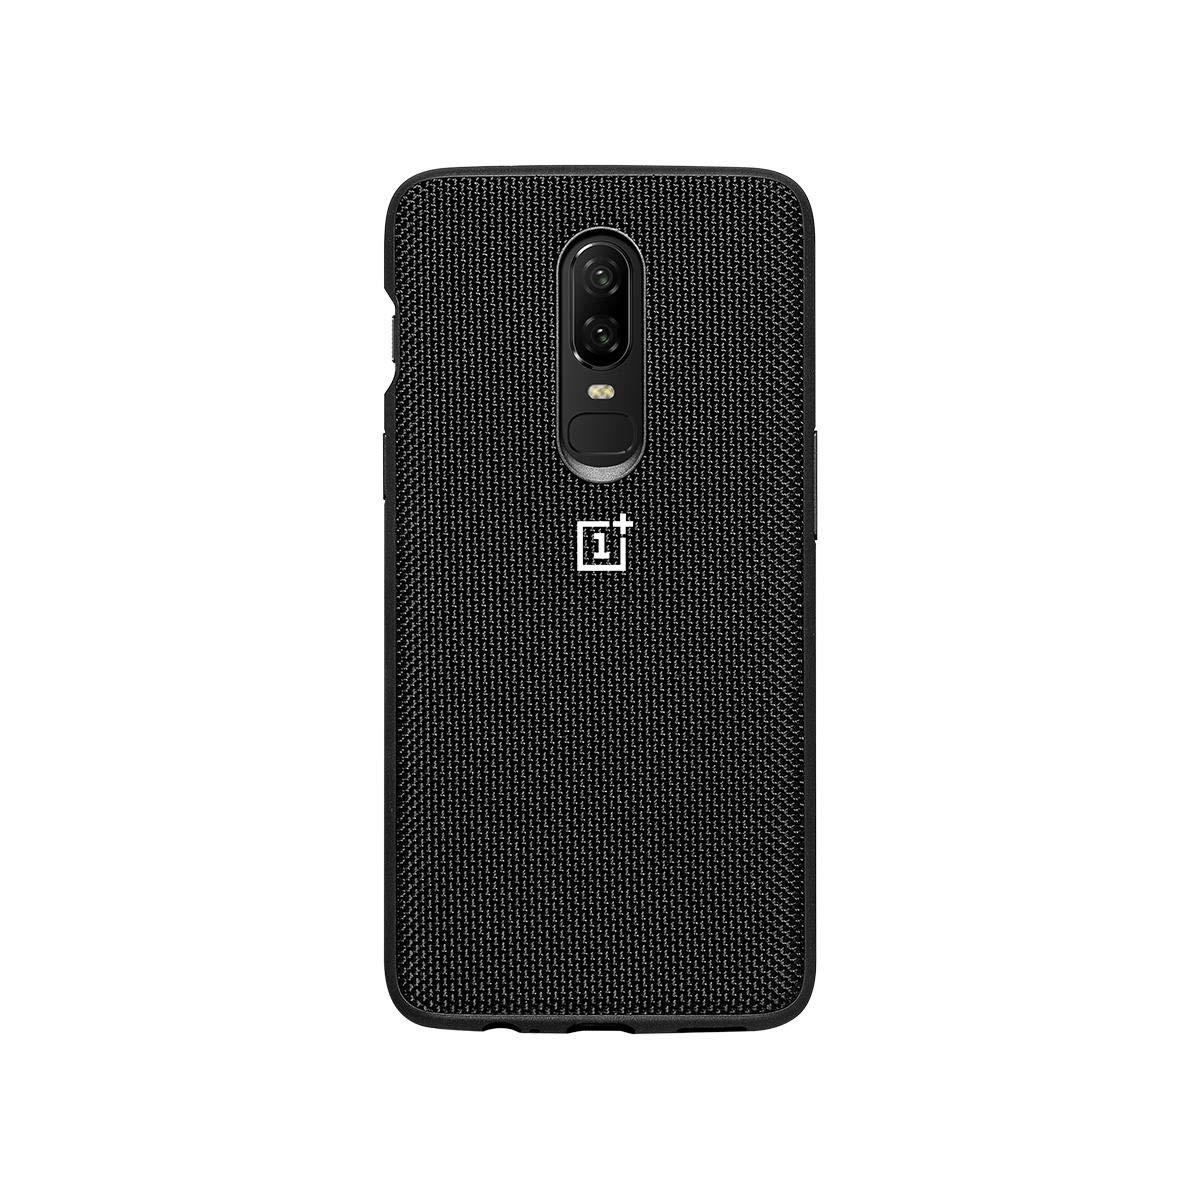 OnePlus 6 Bumper Case Nylon Cover Black